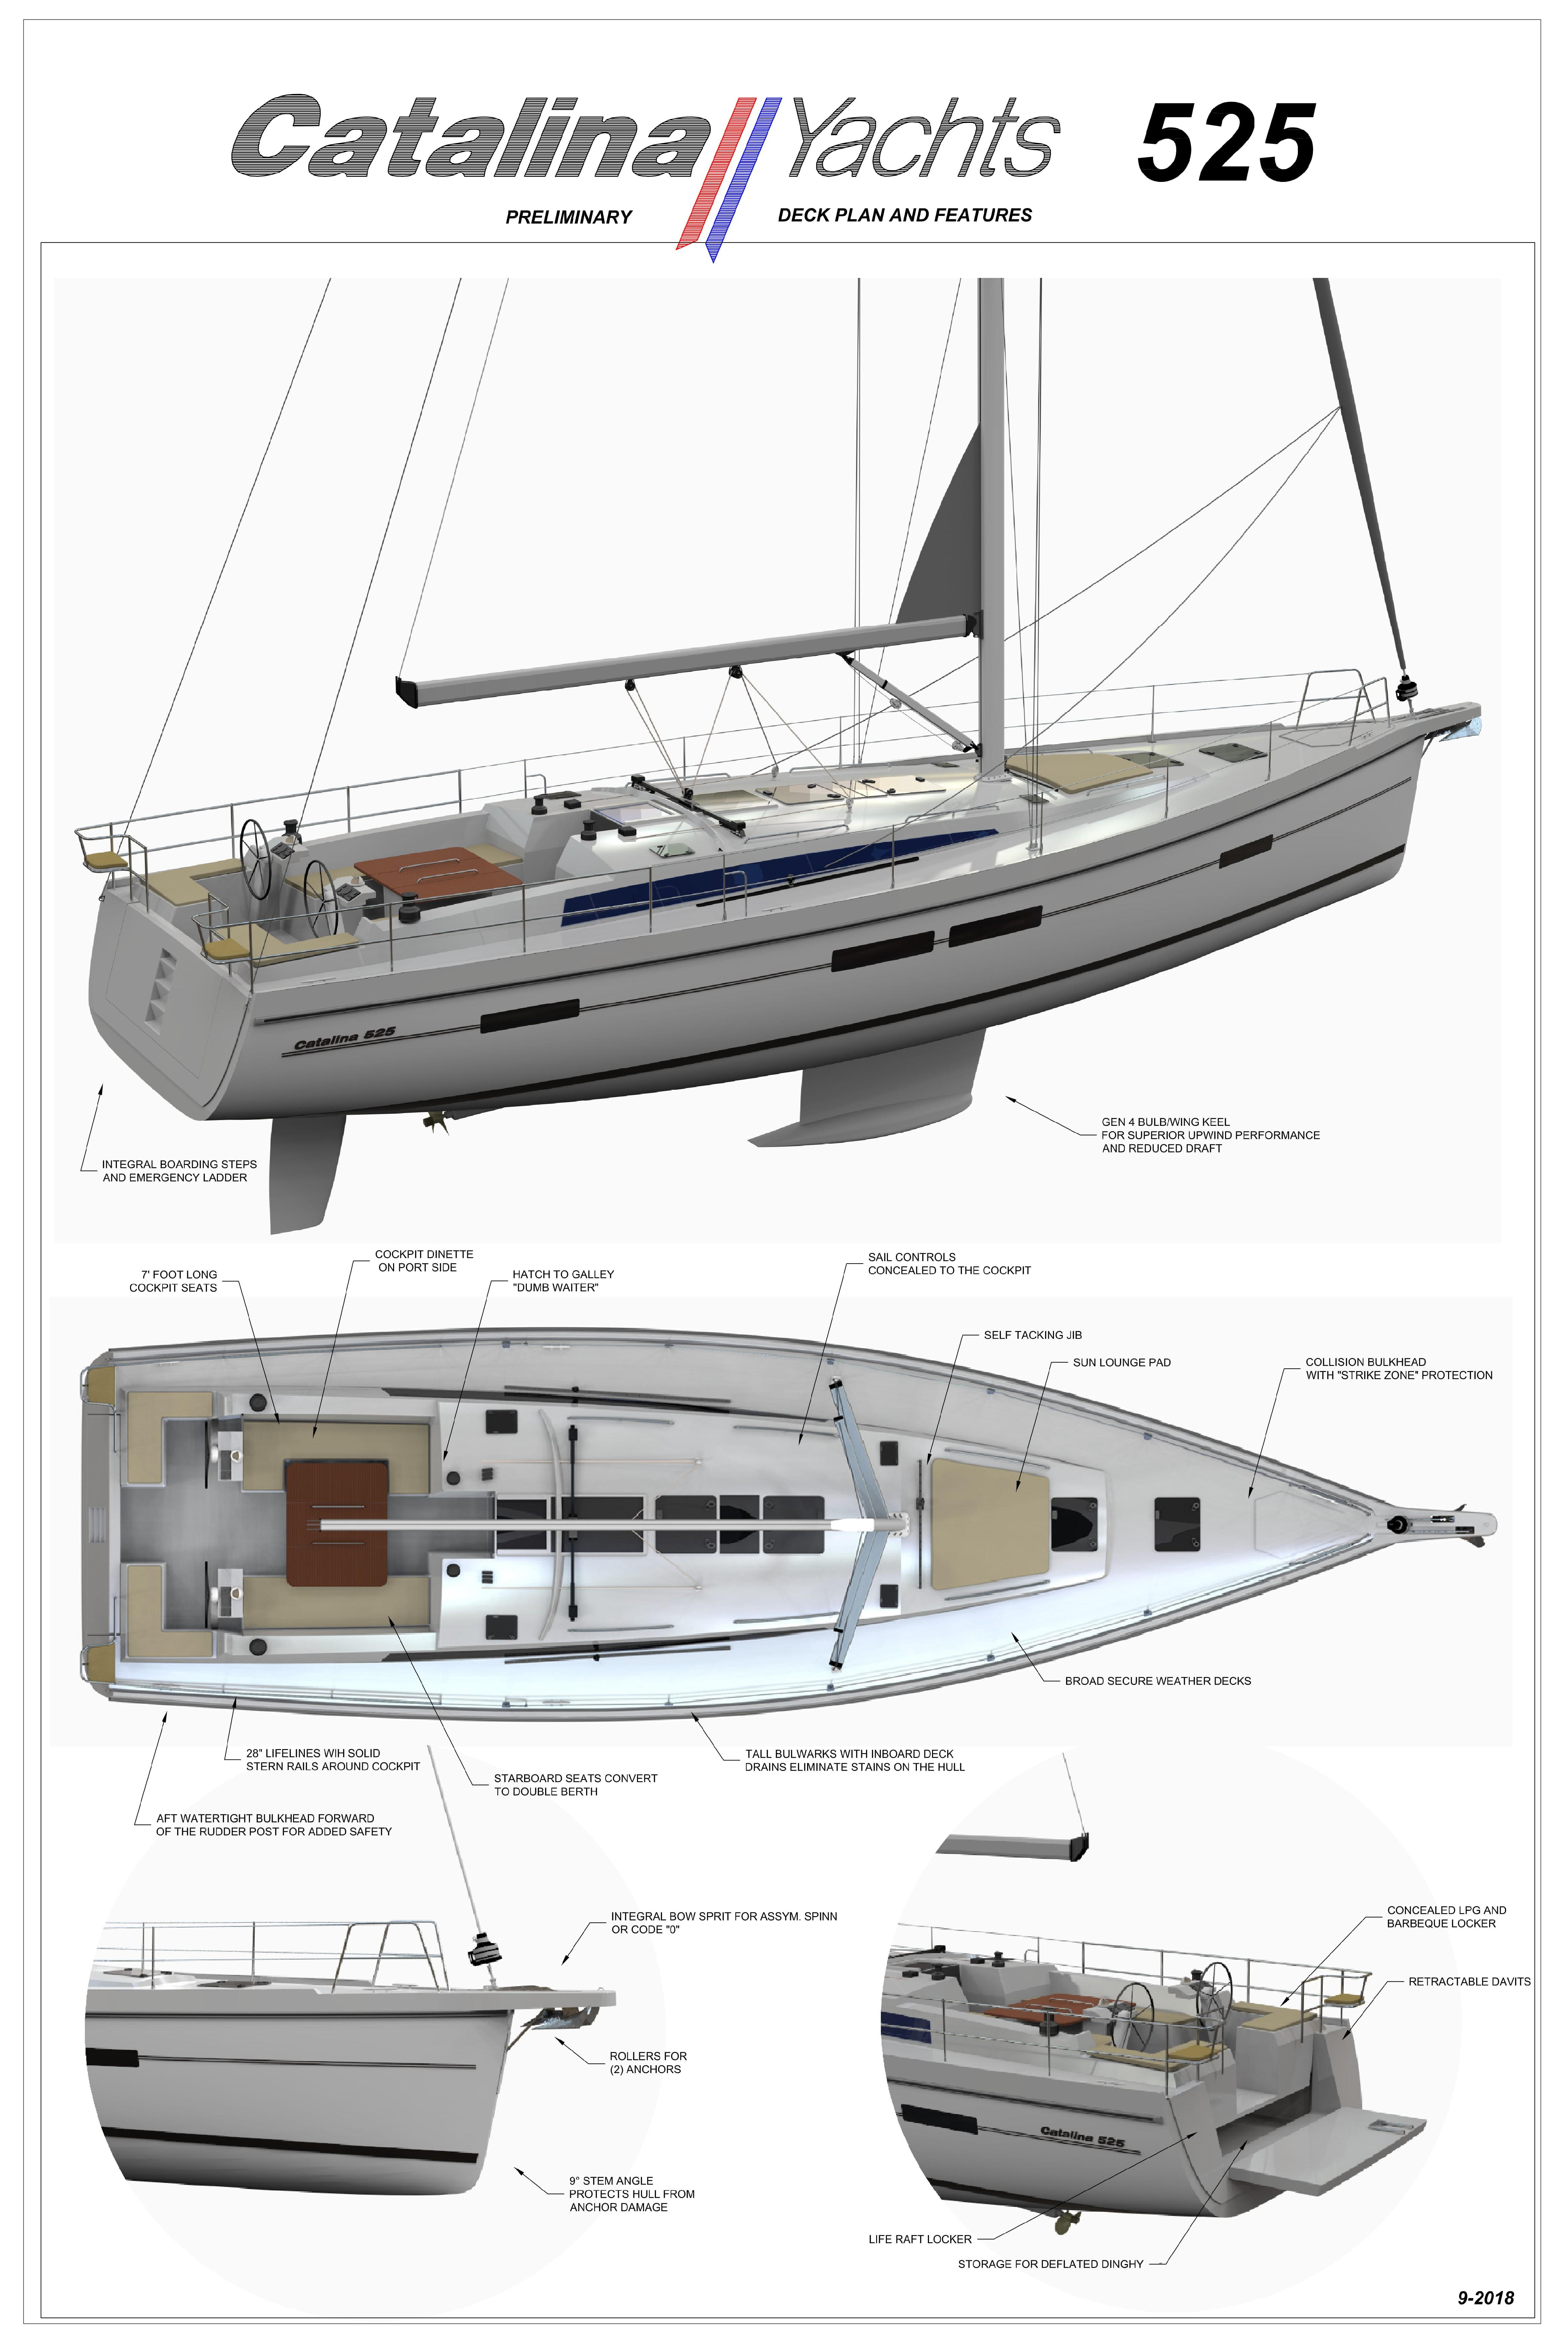 2020 Catalina 545, Riverside New Jersey - boats com